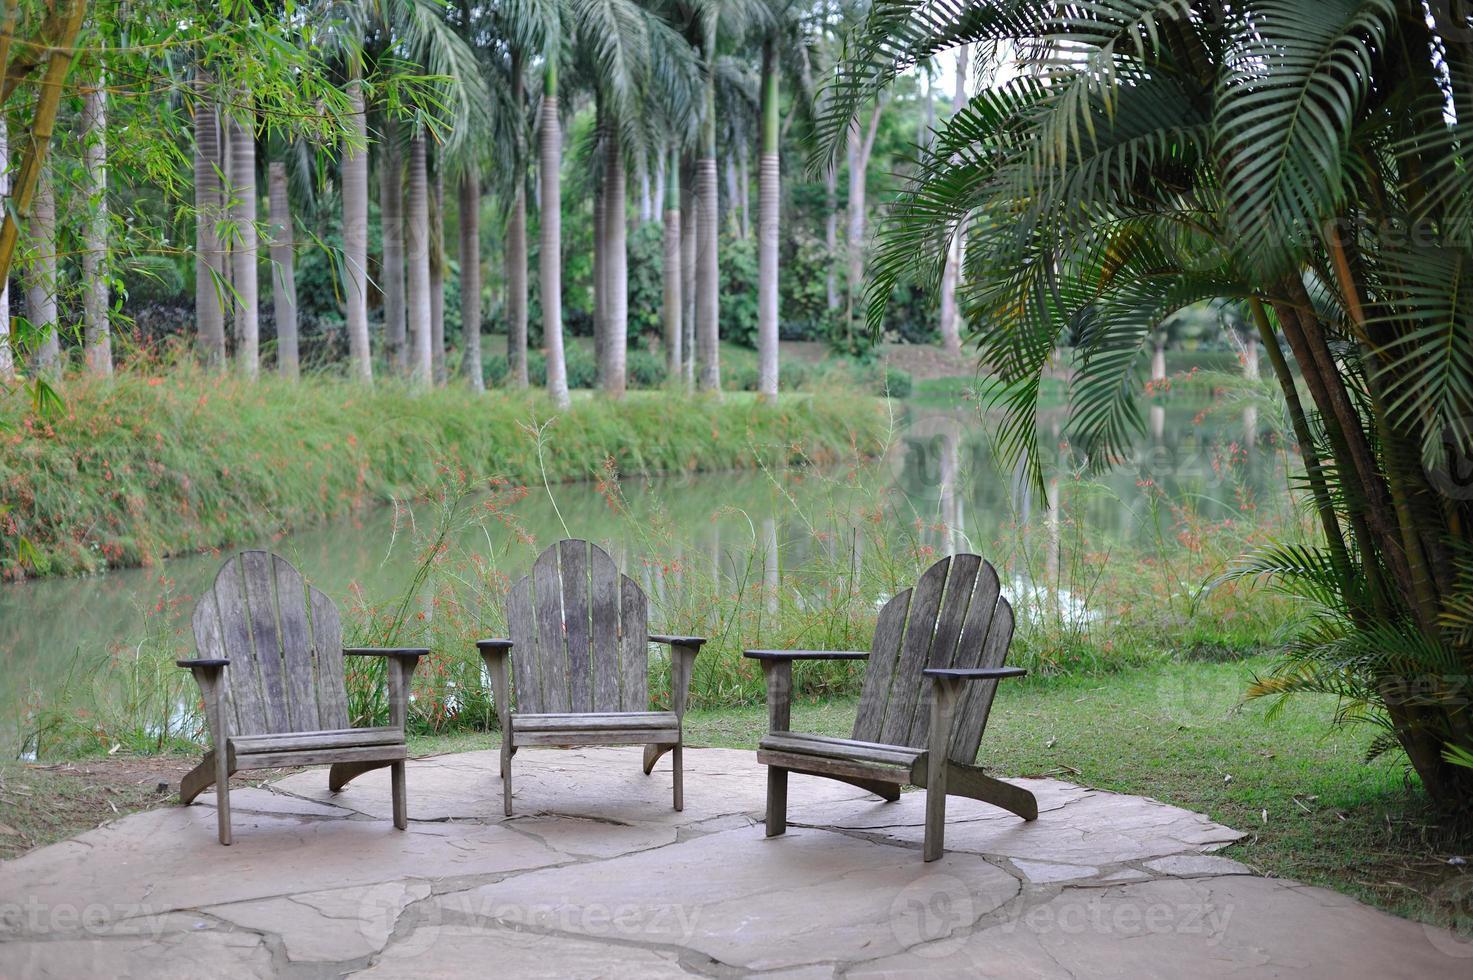 Sitting corner in a brazilian park photo